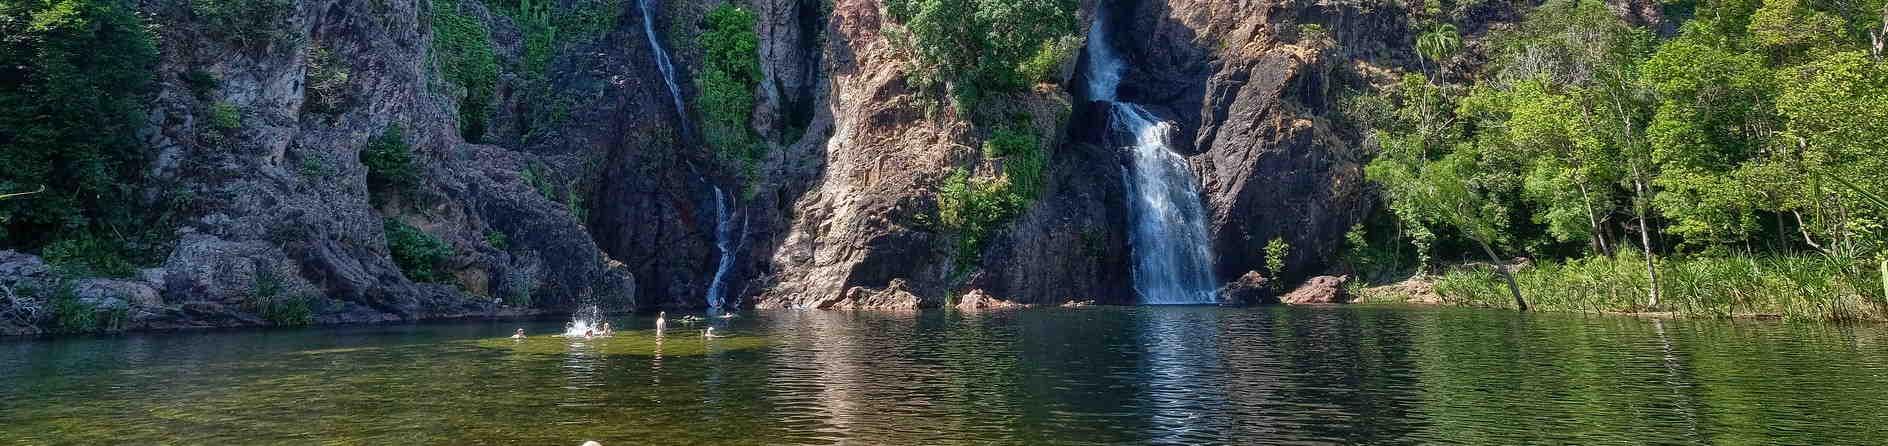 Get to know Kakadu National Park's neighbour